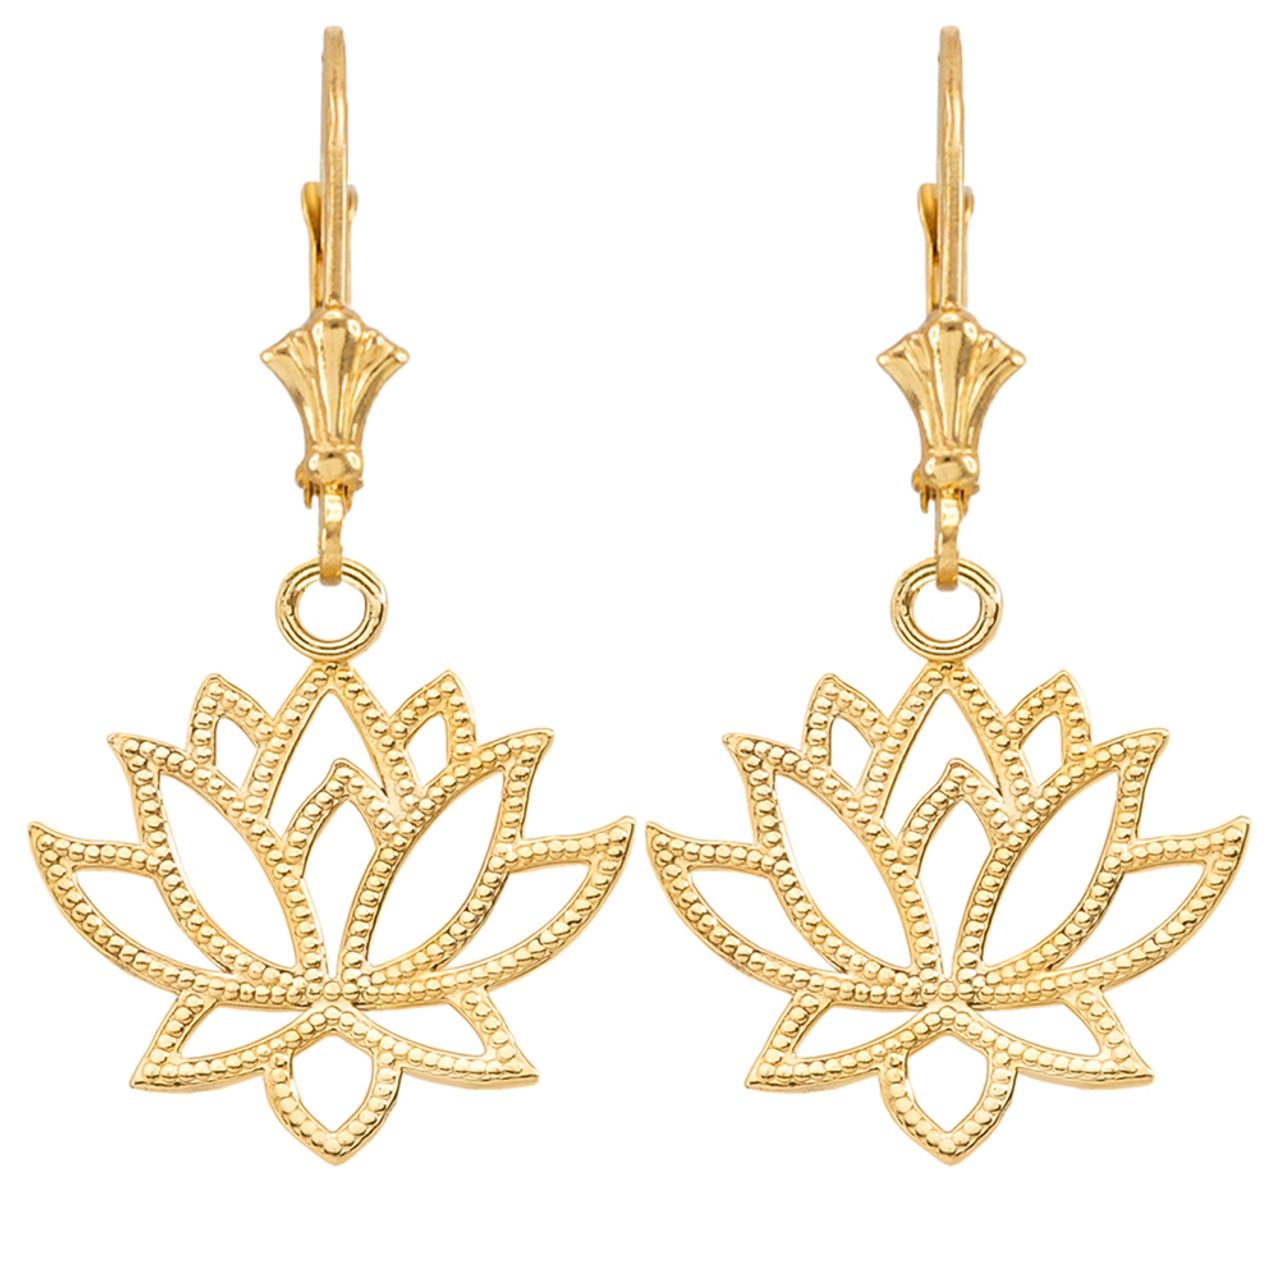 Lotus Flower Earrings In Yellow Gold